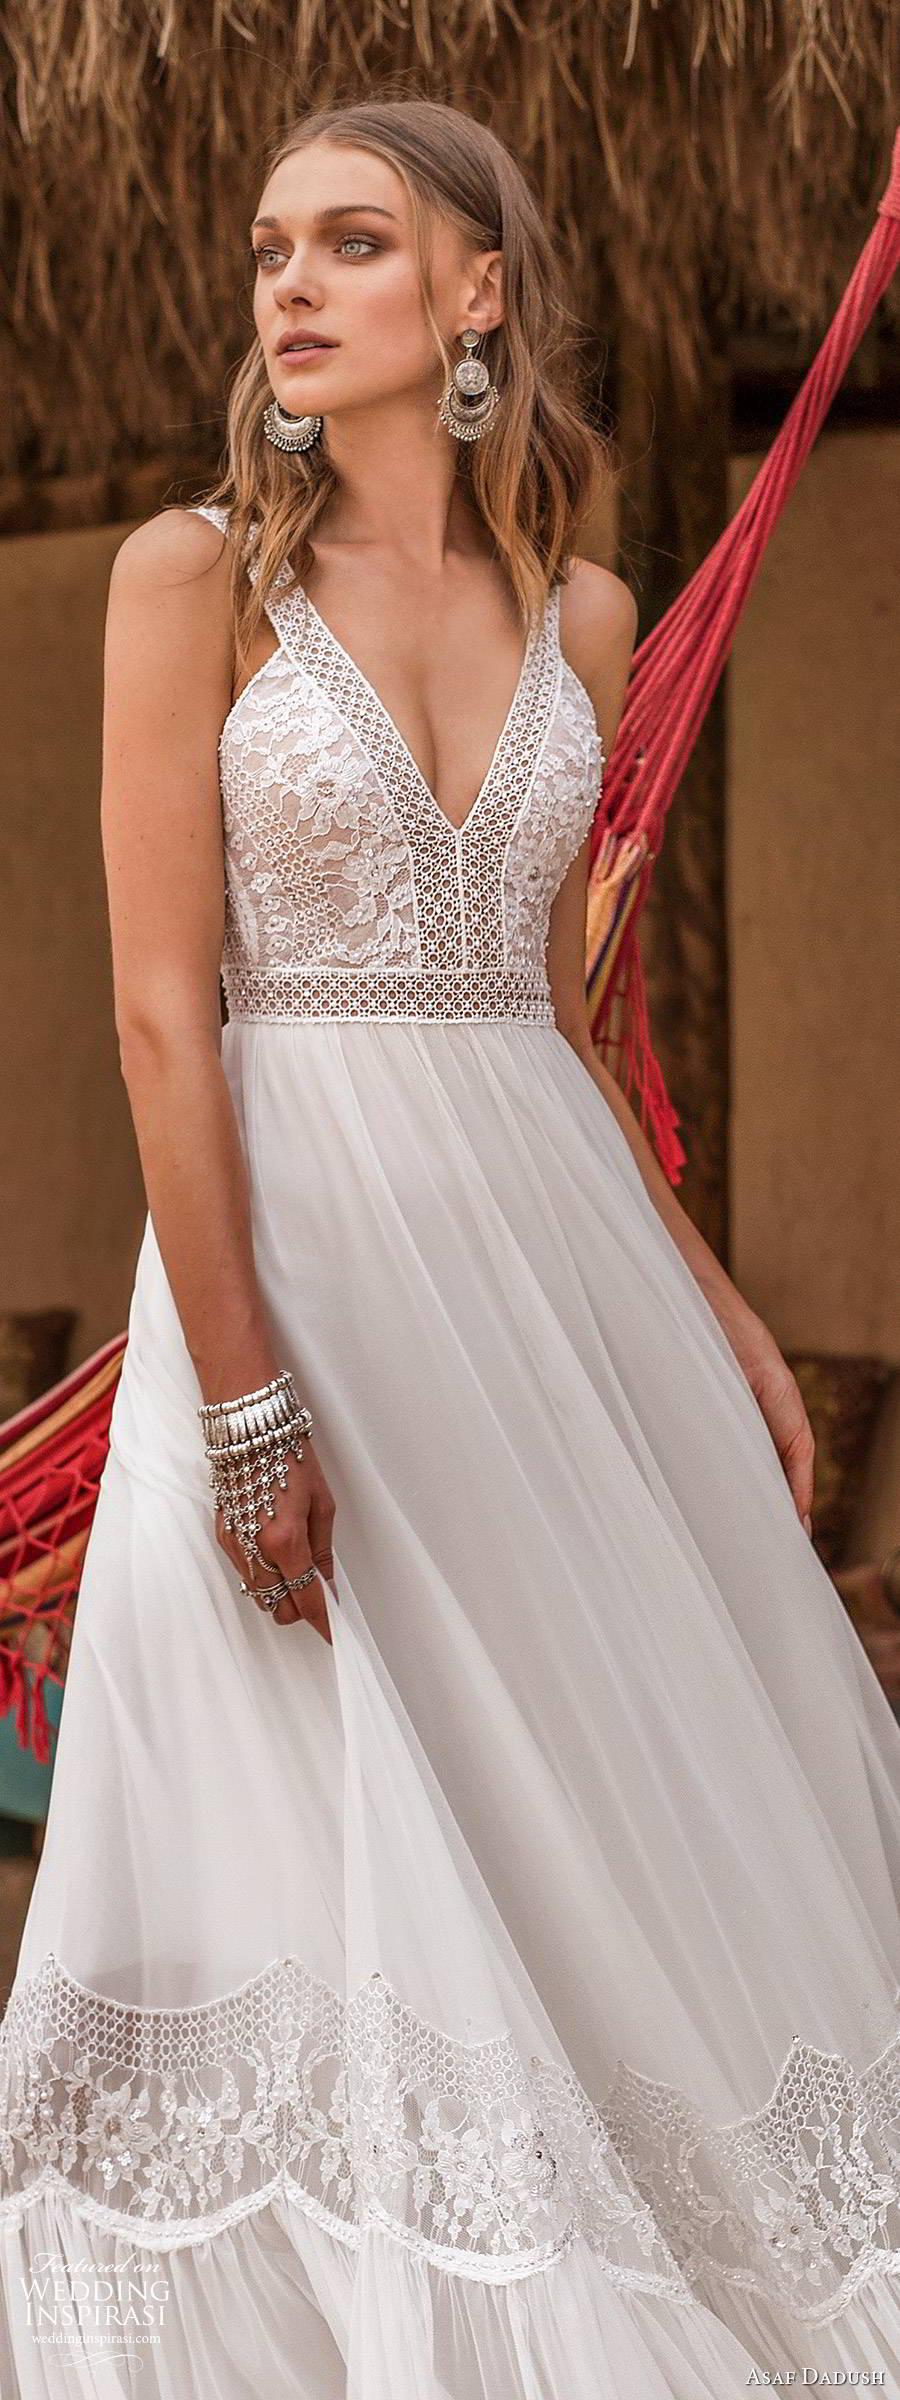 asaf dadush 2019 bridal sleeveless thick straps v neckline embellished bodice romantic a line ball gown wedding dress (3) zv